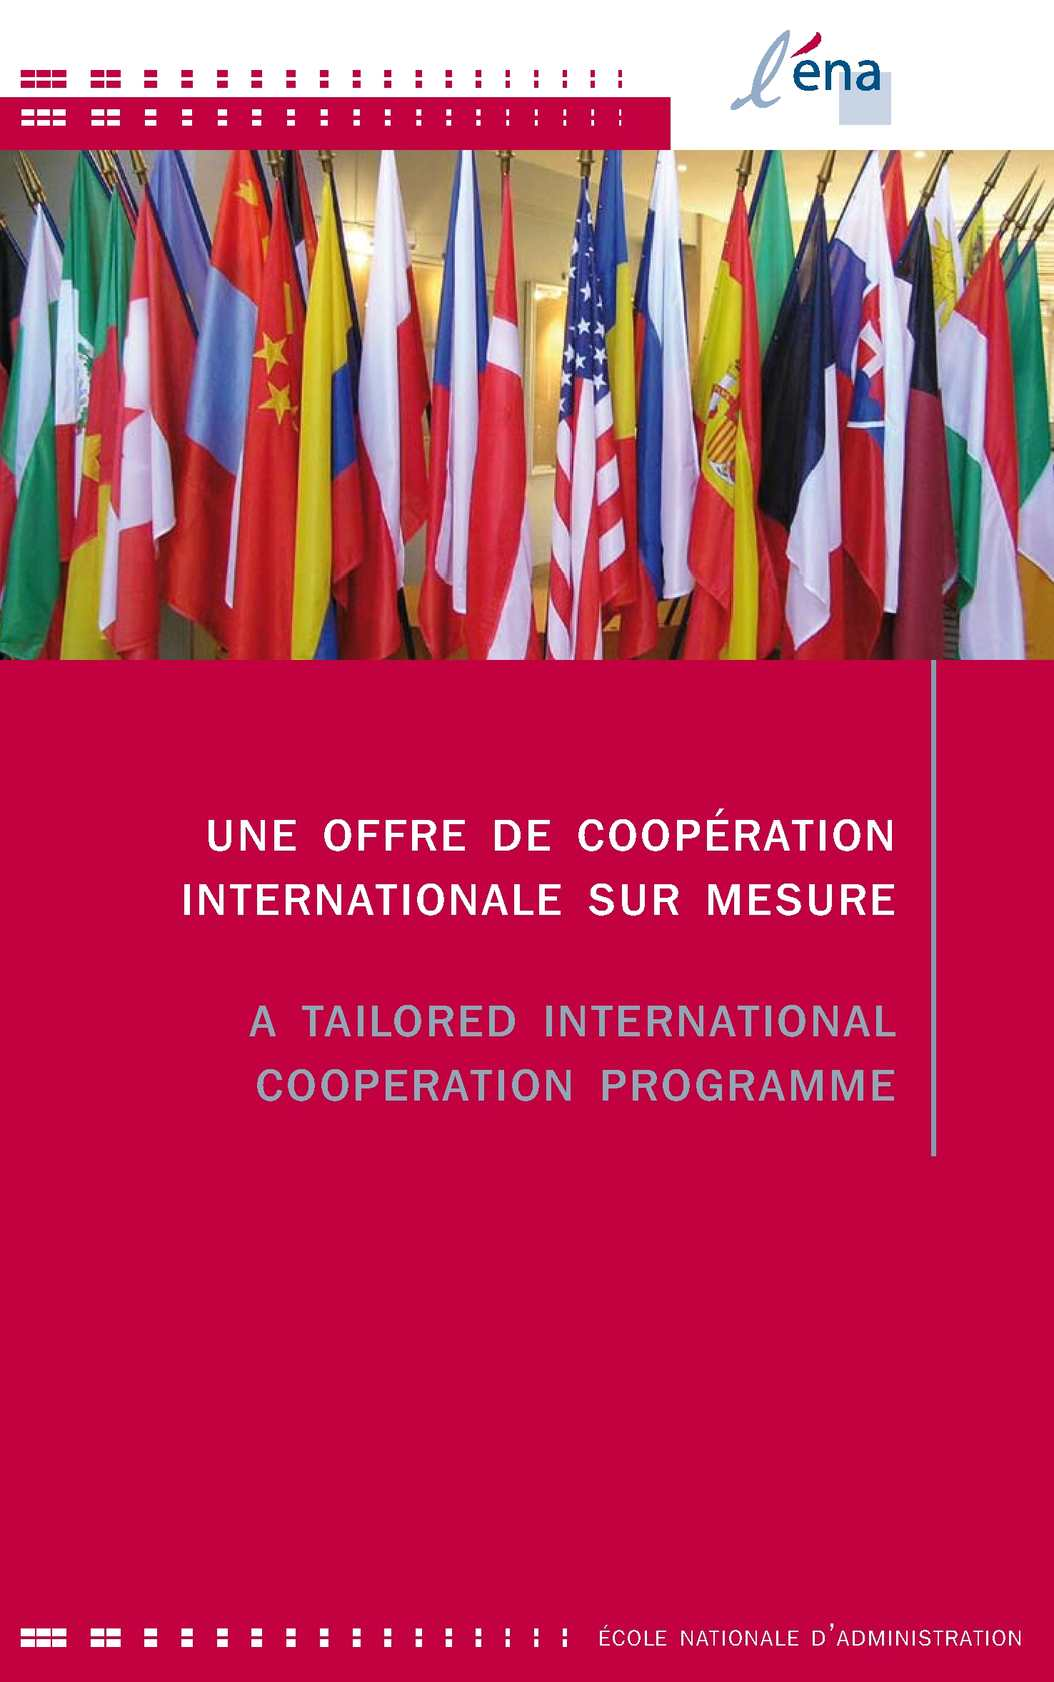 La coopération internationale